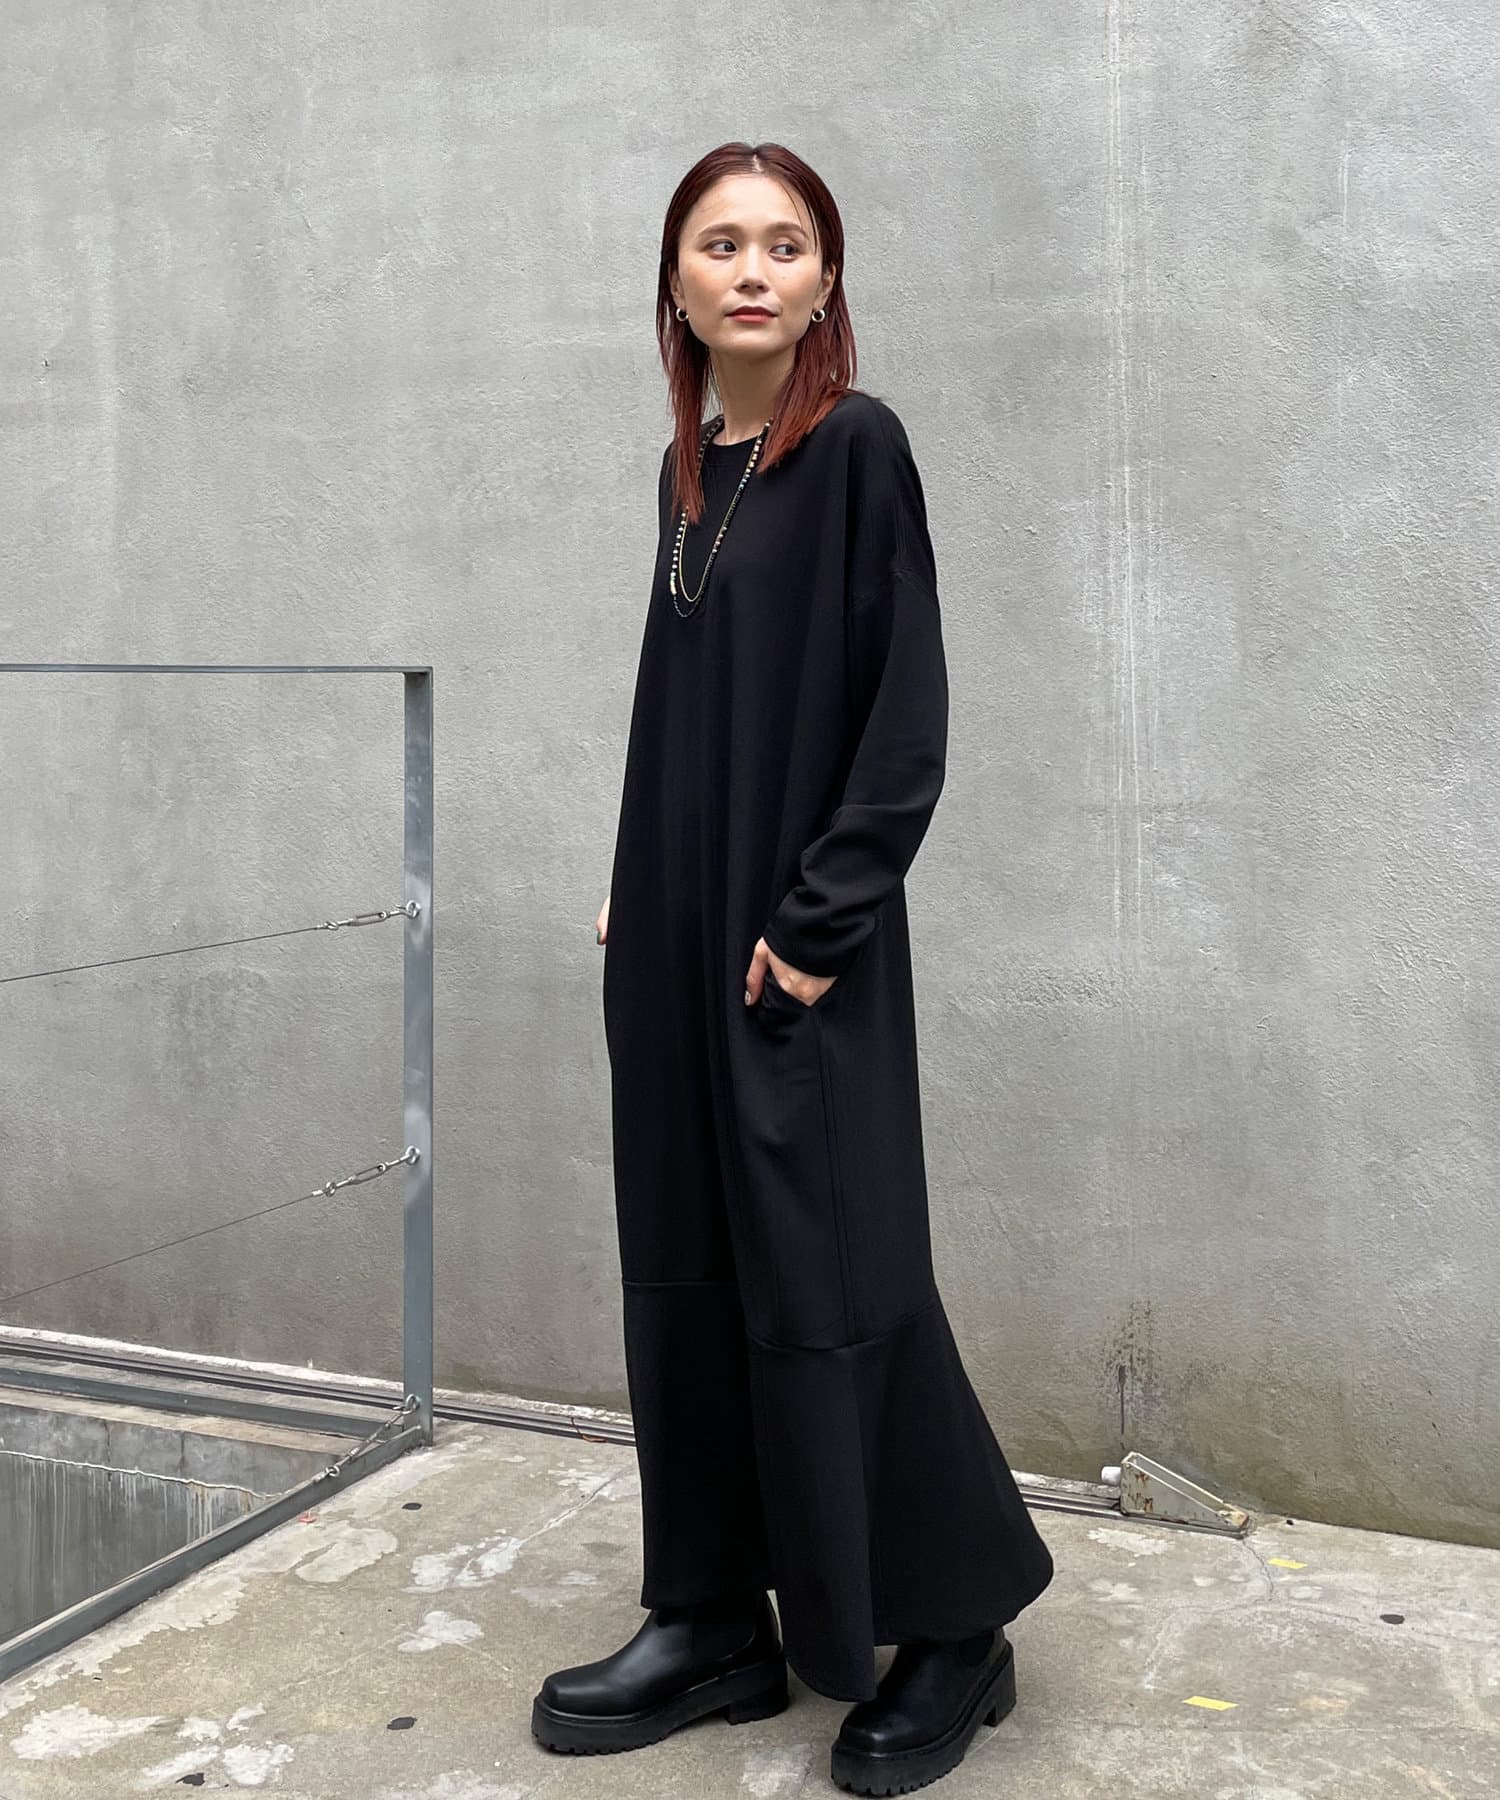 Omekashi(オメカシ) Önf(オンフ) カットジョーゼットペプラムドレス